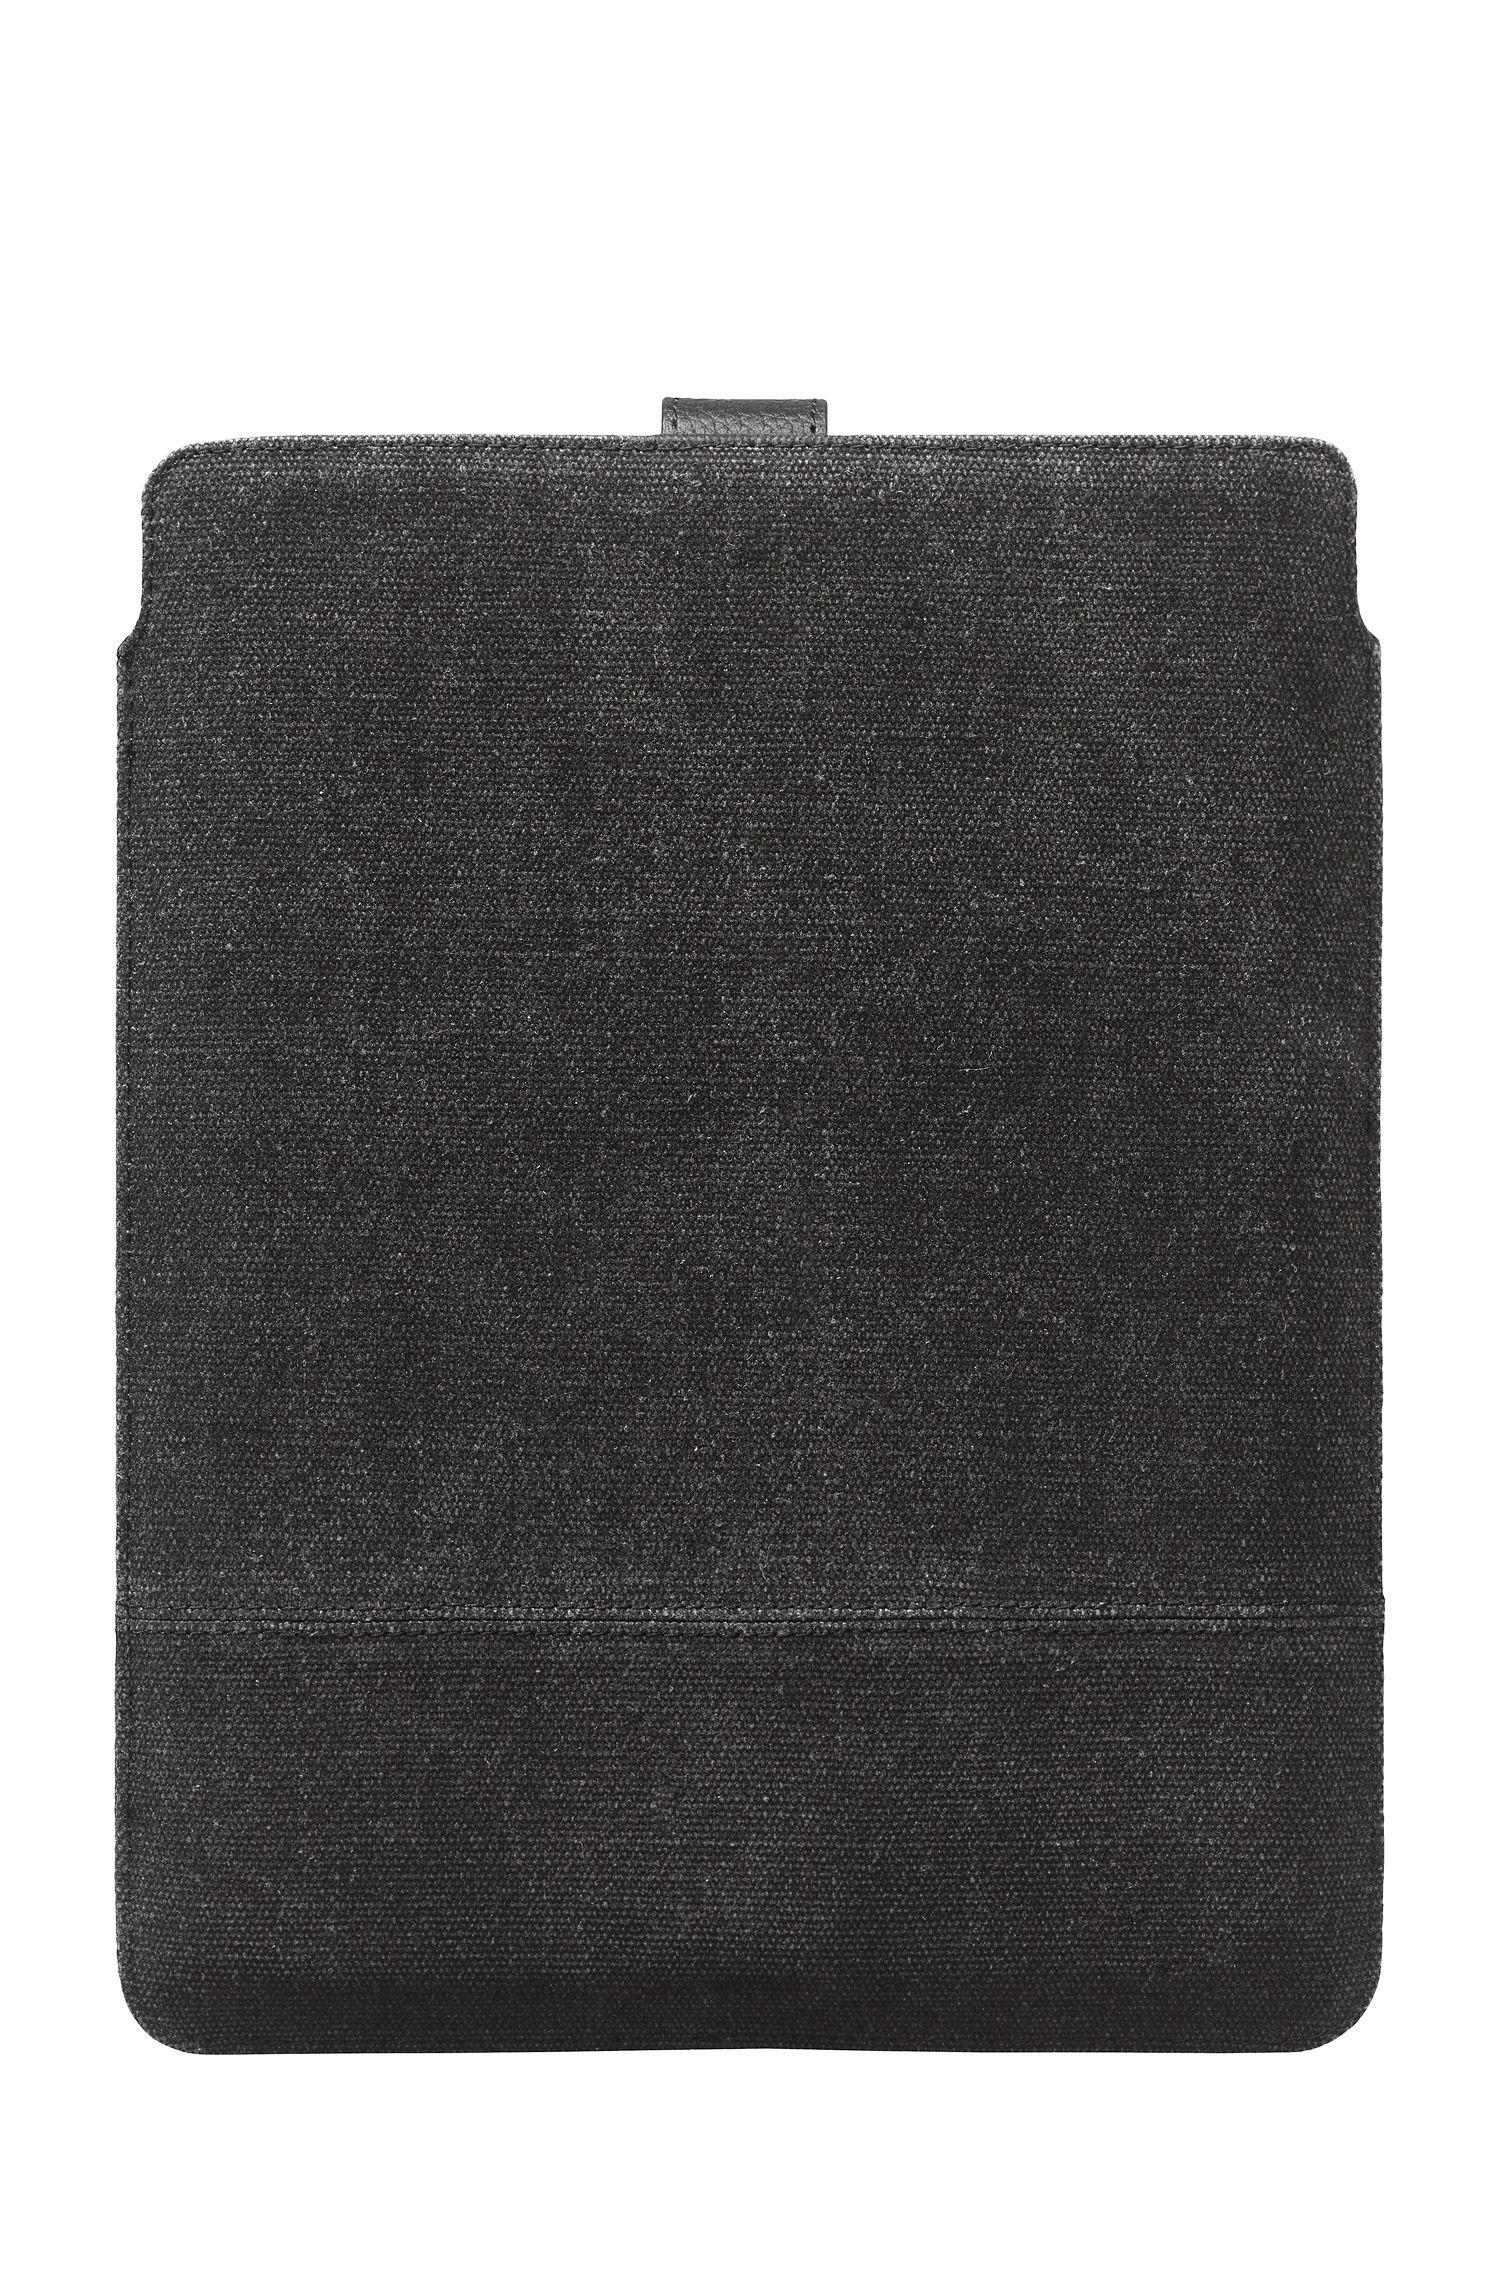 Schutzhülle ´PILOT` für Tablet-Computer